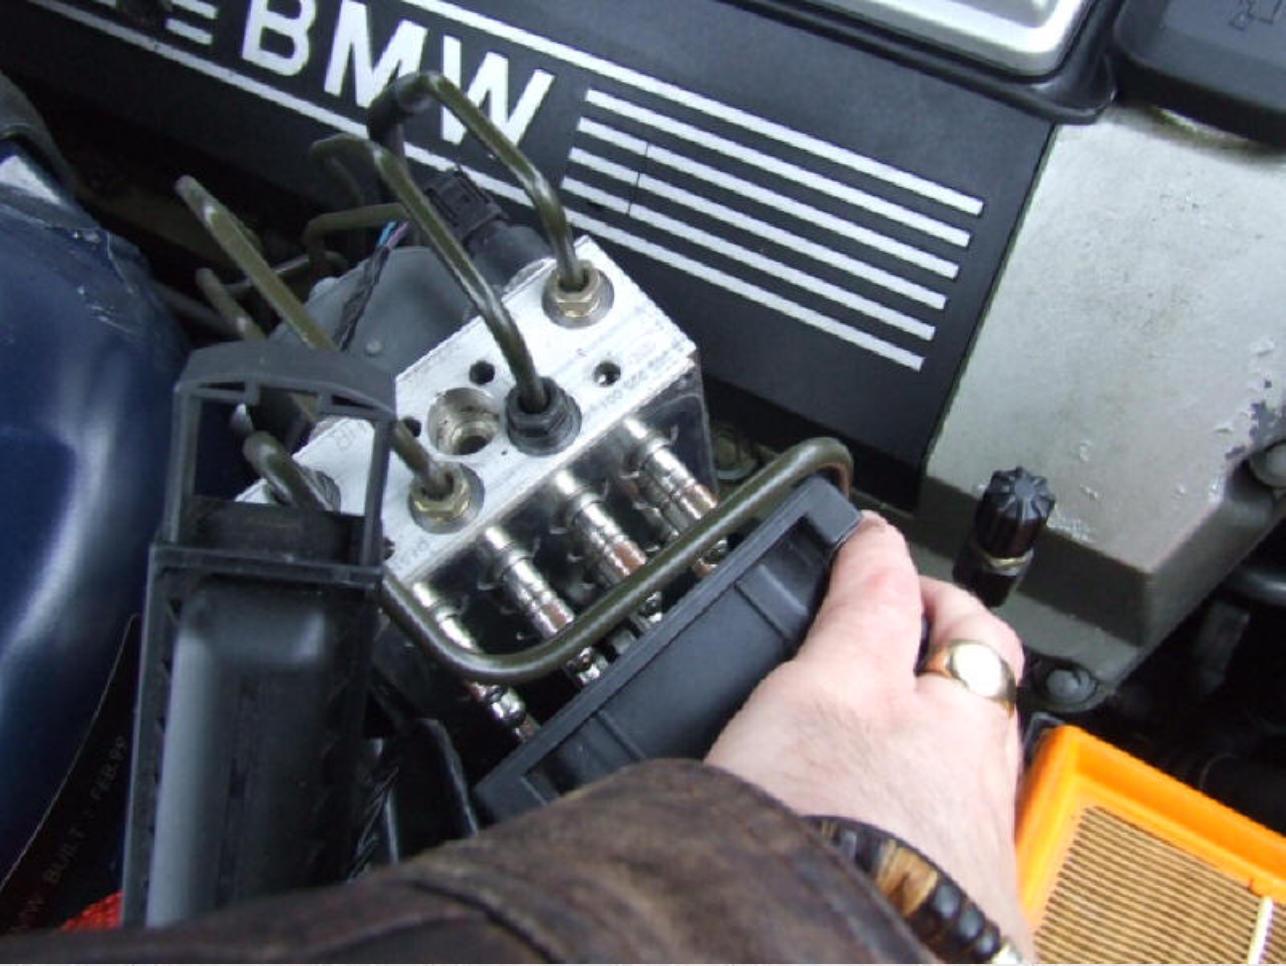 BMW E38 ABS DSC Brake Failure Repair 735i 740i 750i